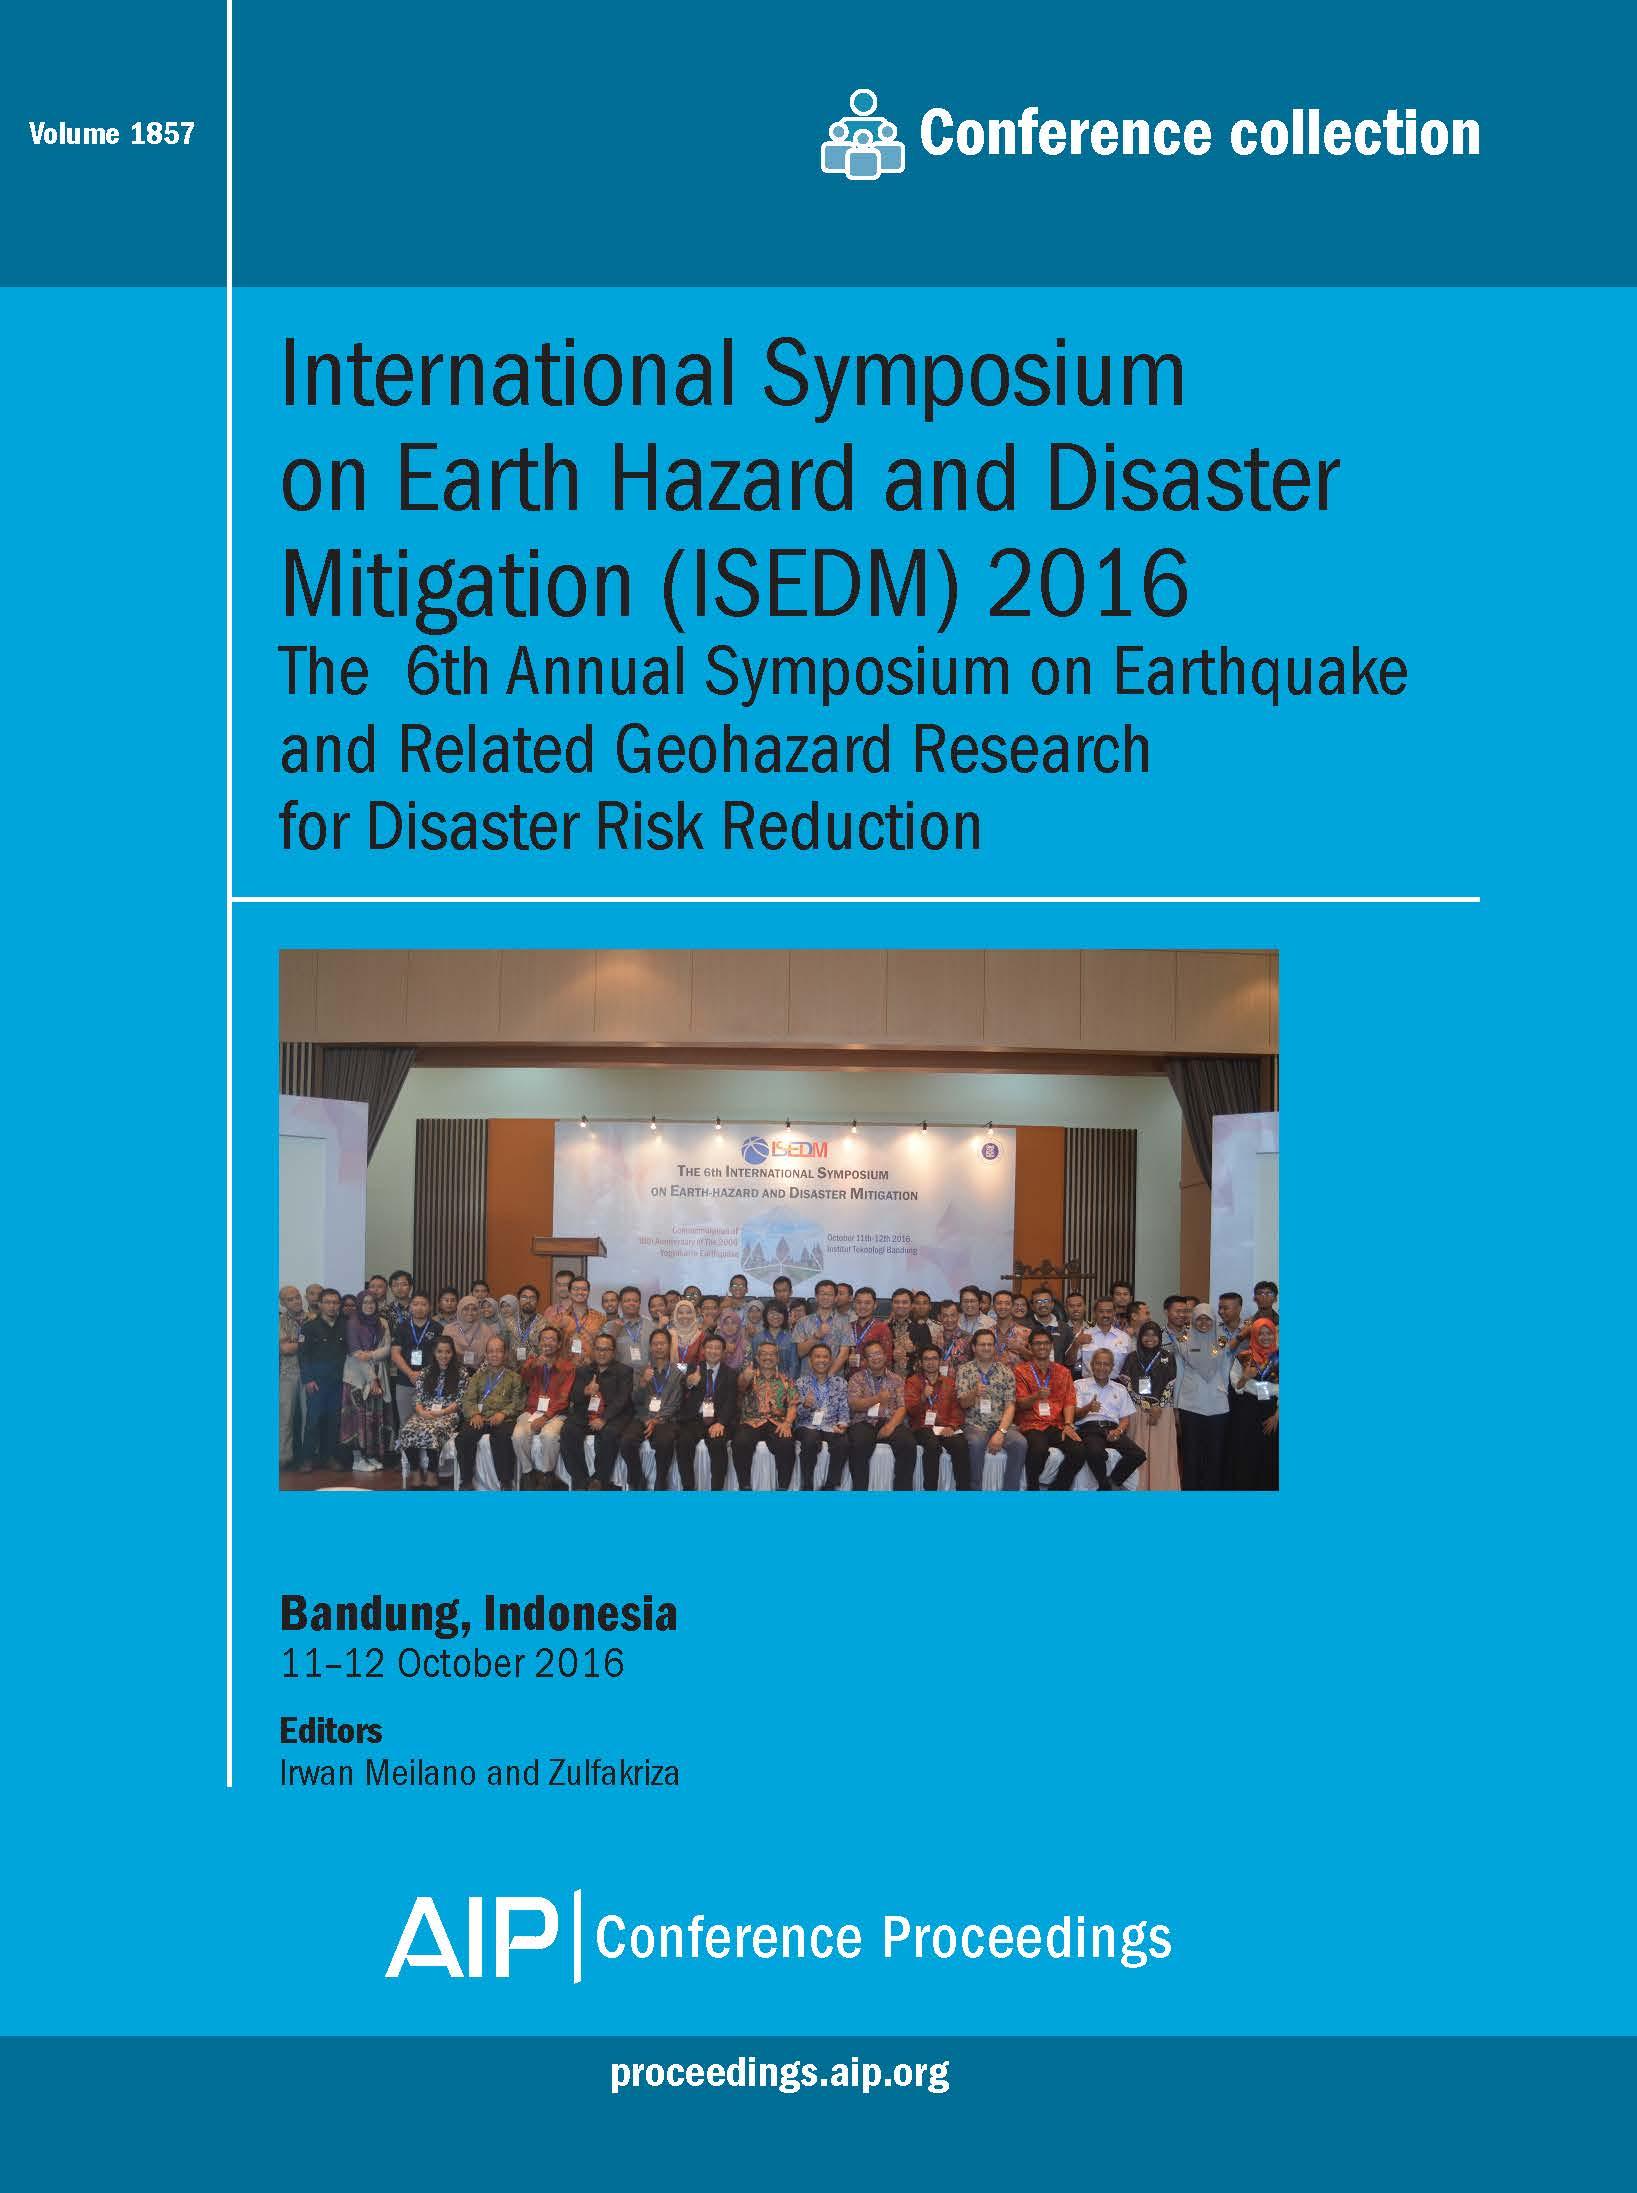 Volume 1857: International Symposium on Earth Hazard and Disaster